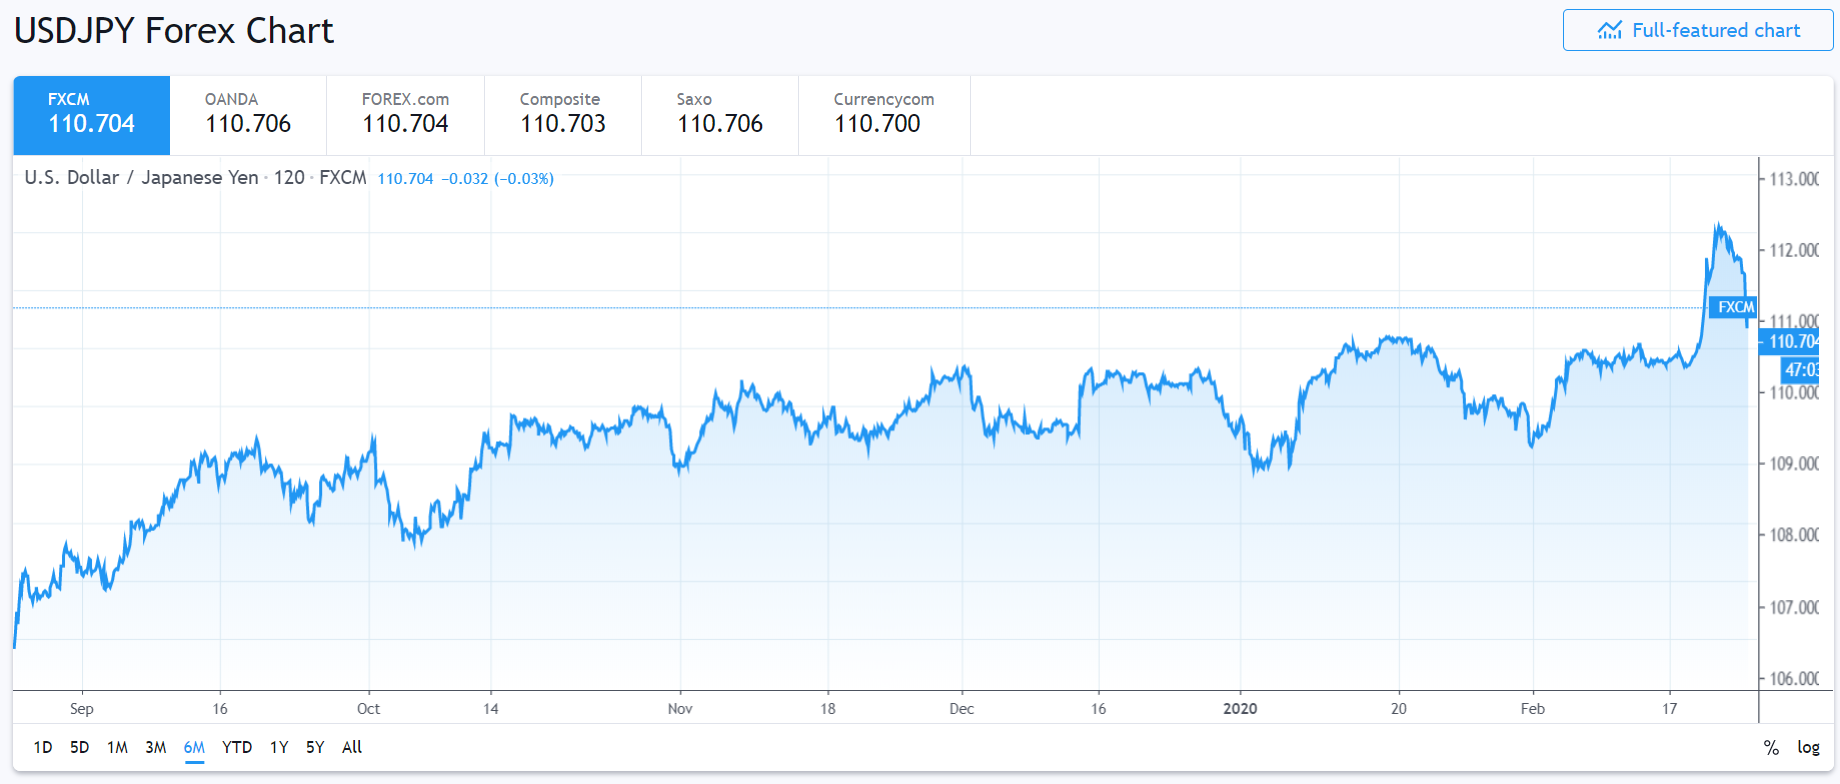 FXCM-TRADING VIEW - USD JPY 6 M Chart - 25 Feb 2020